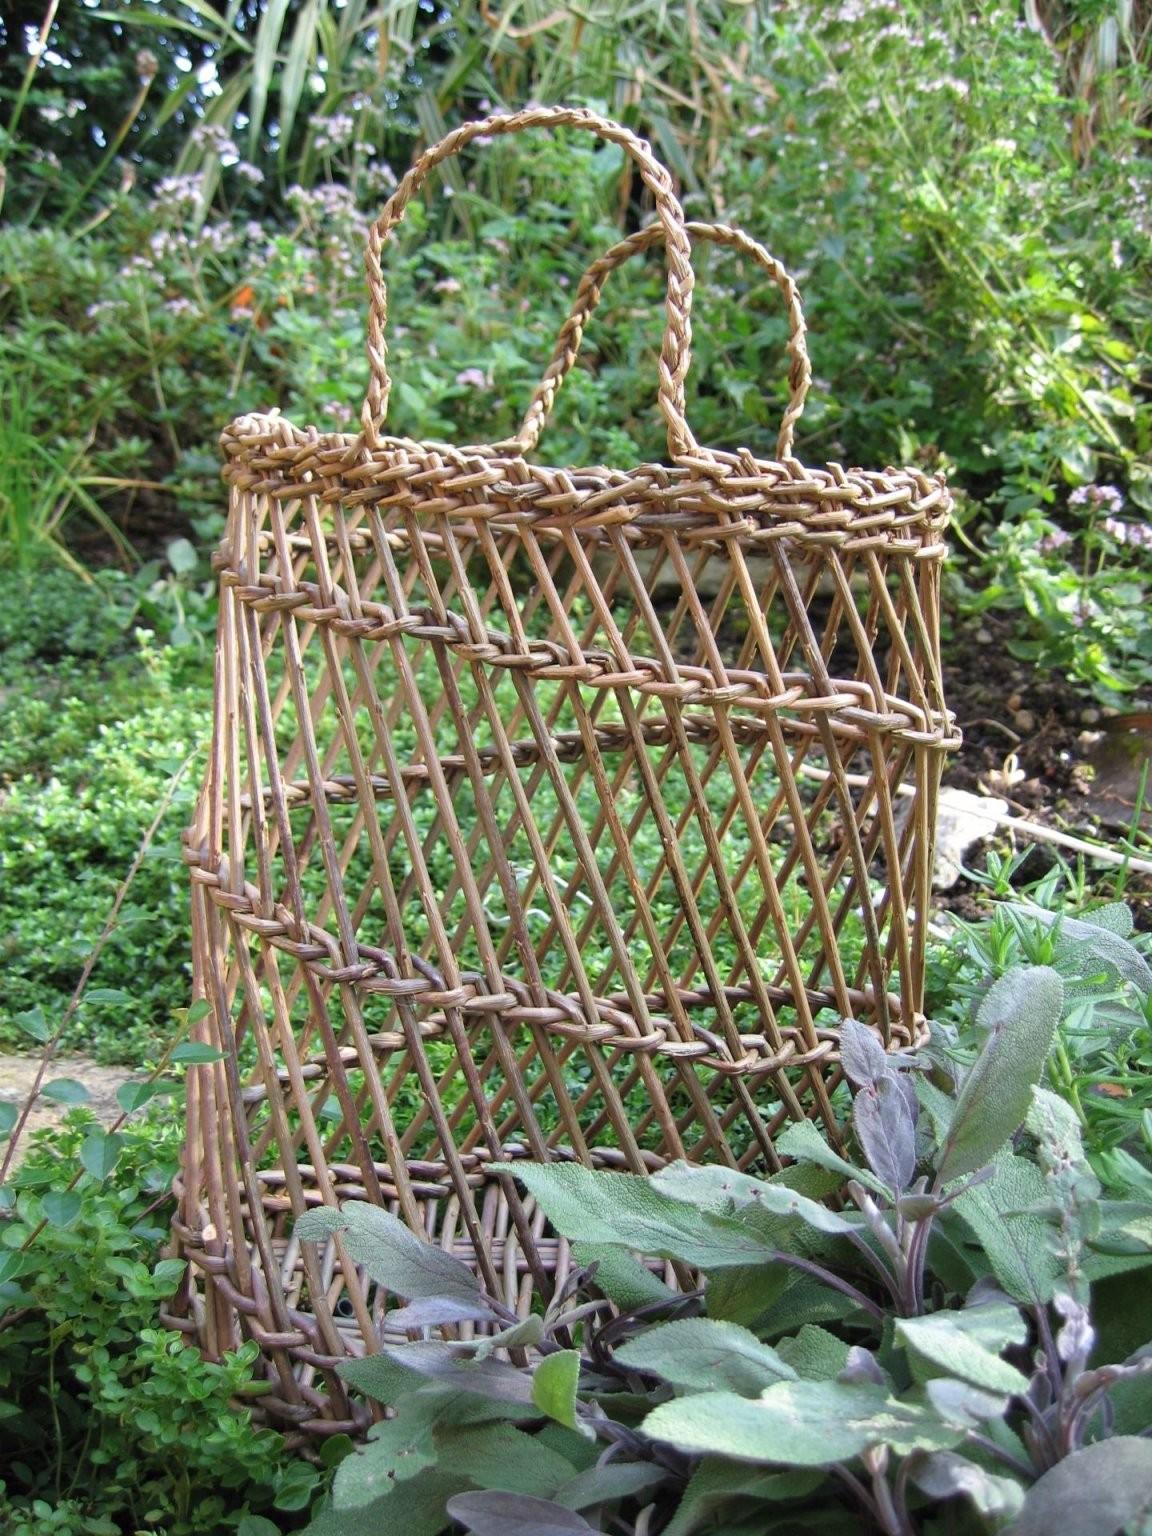 Inspirasjonklarapil  Willow  Weidengeflecht Weiden Flechten Weiden von Weidengeflechte Für Haus Und Garten Photo